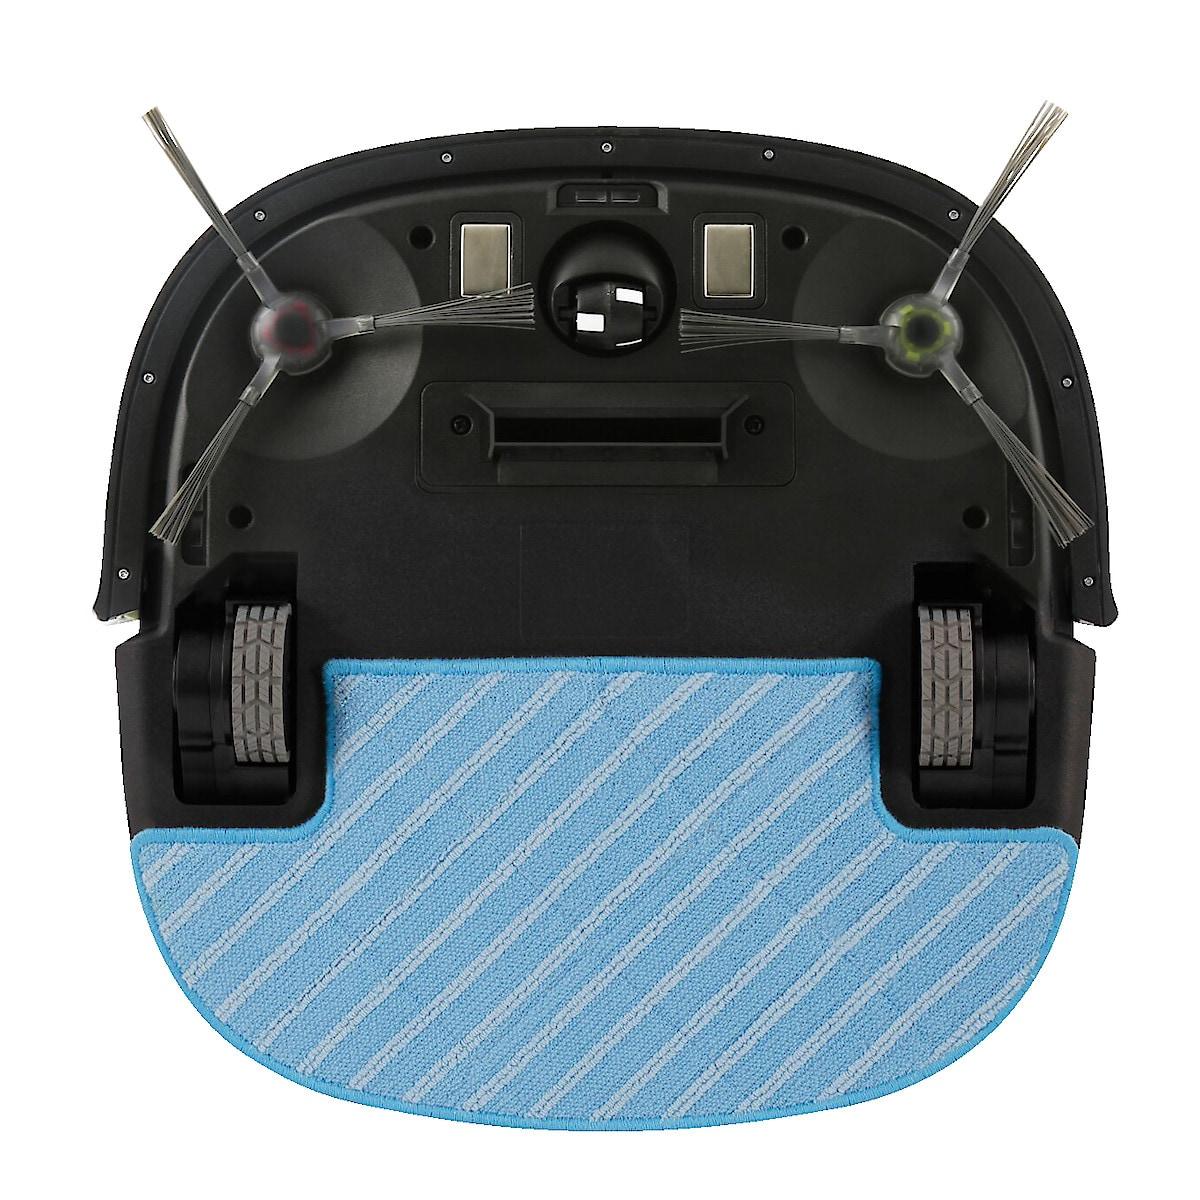 Staubsaugerroboter Ecovacs Deebot Slim2